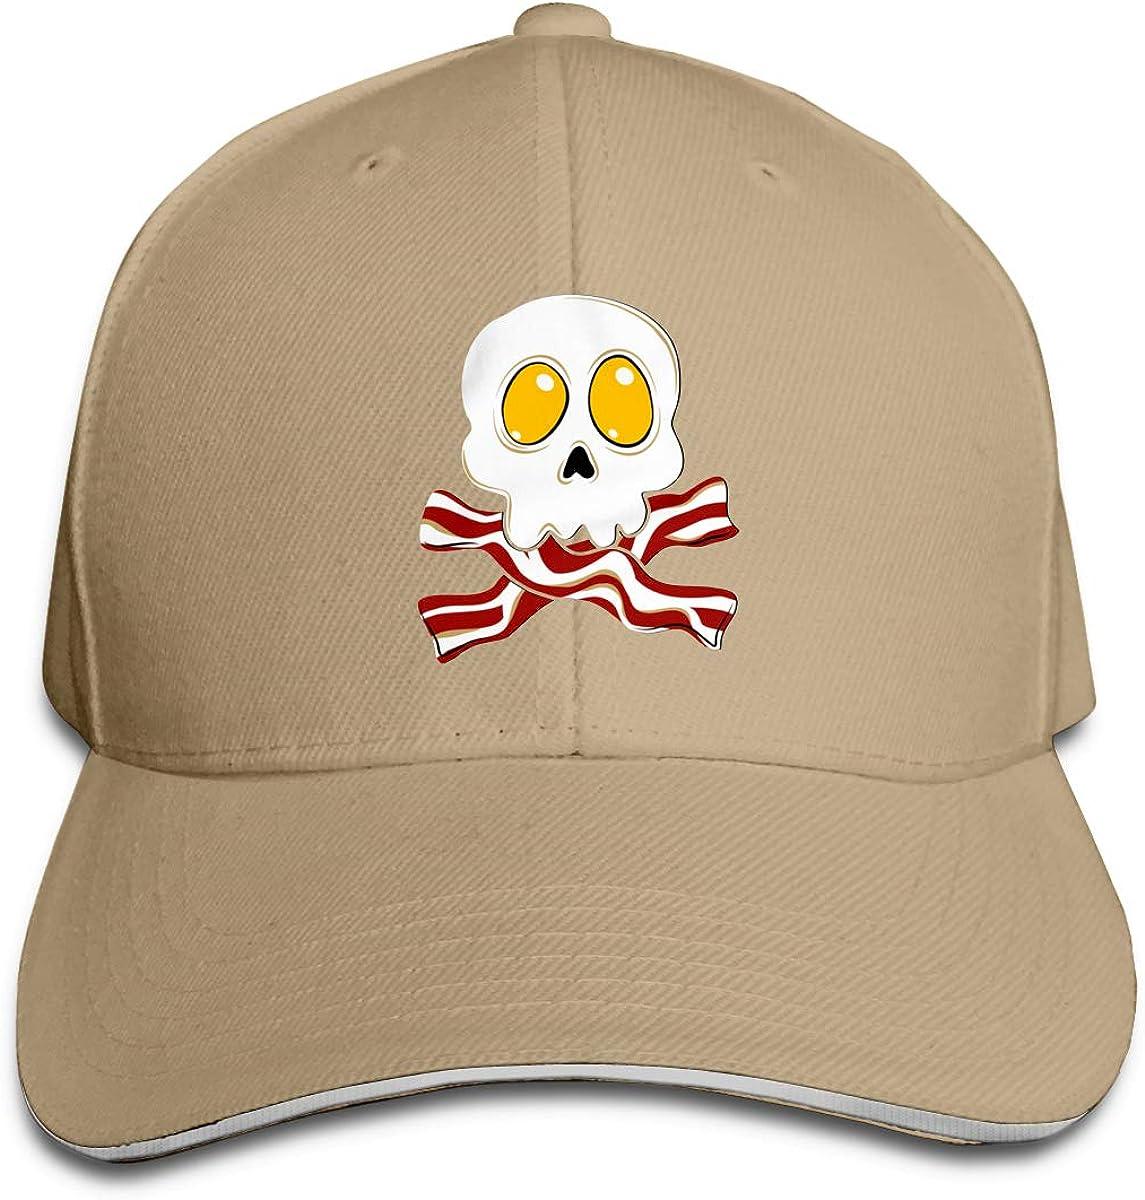 Bacon Eggs Skull Crossbones Men and Women Adjustable Sandwich Peaked Baseball Cap